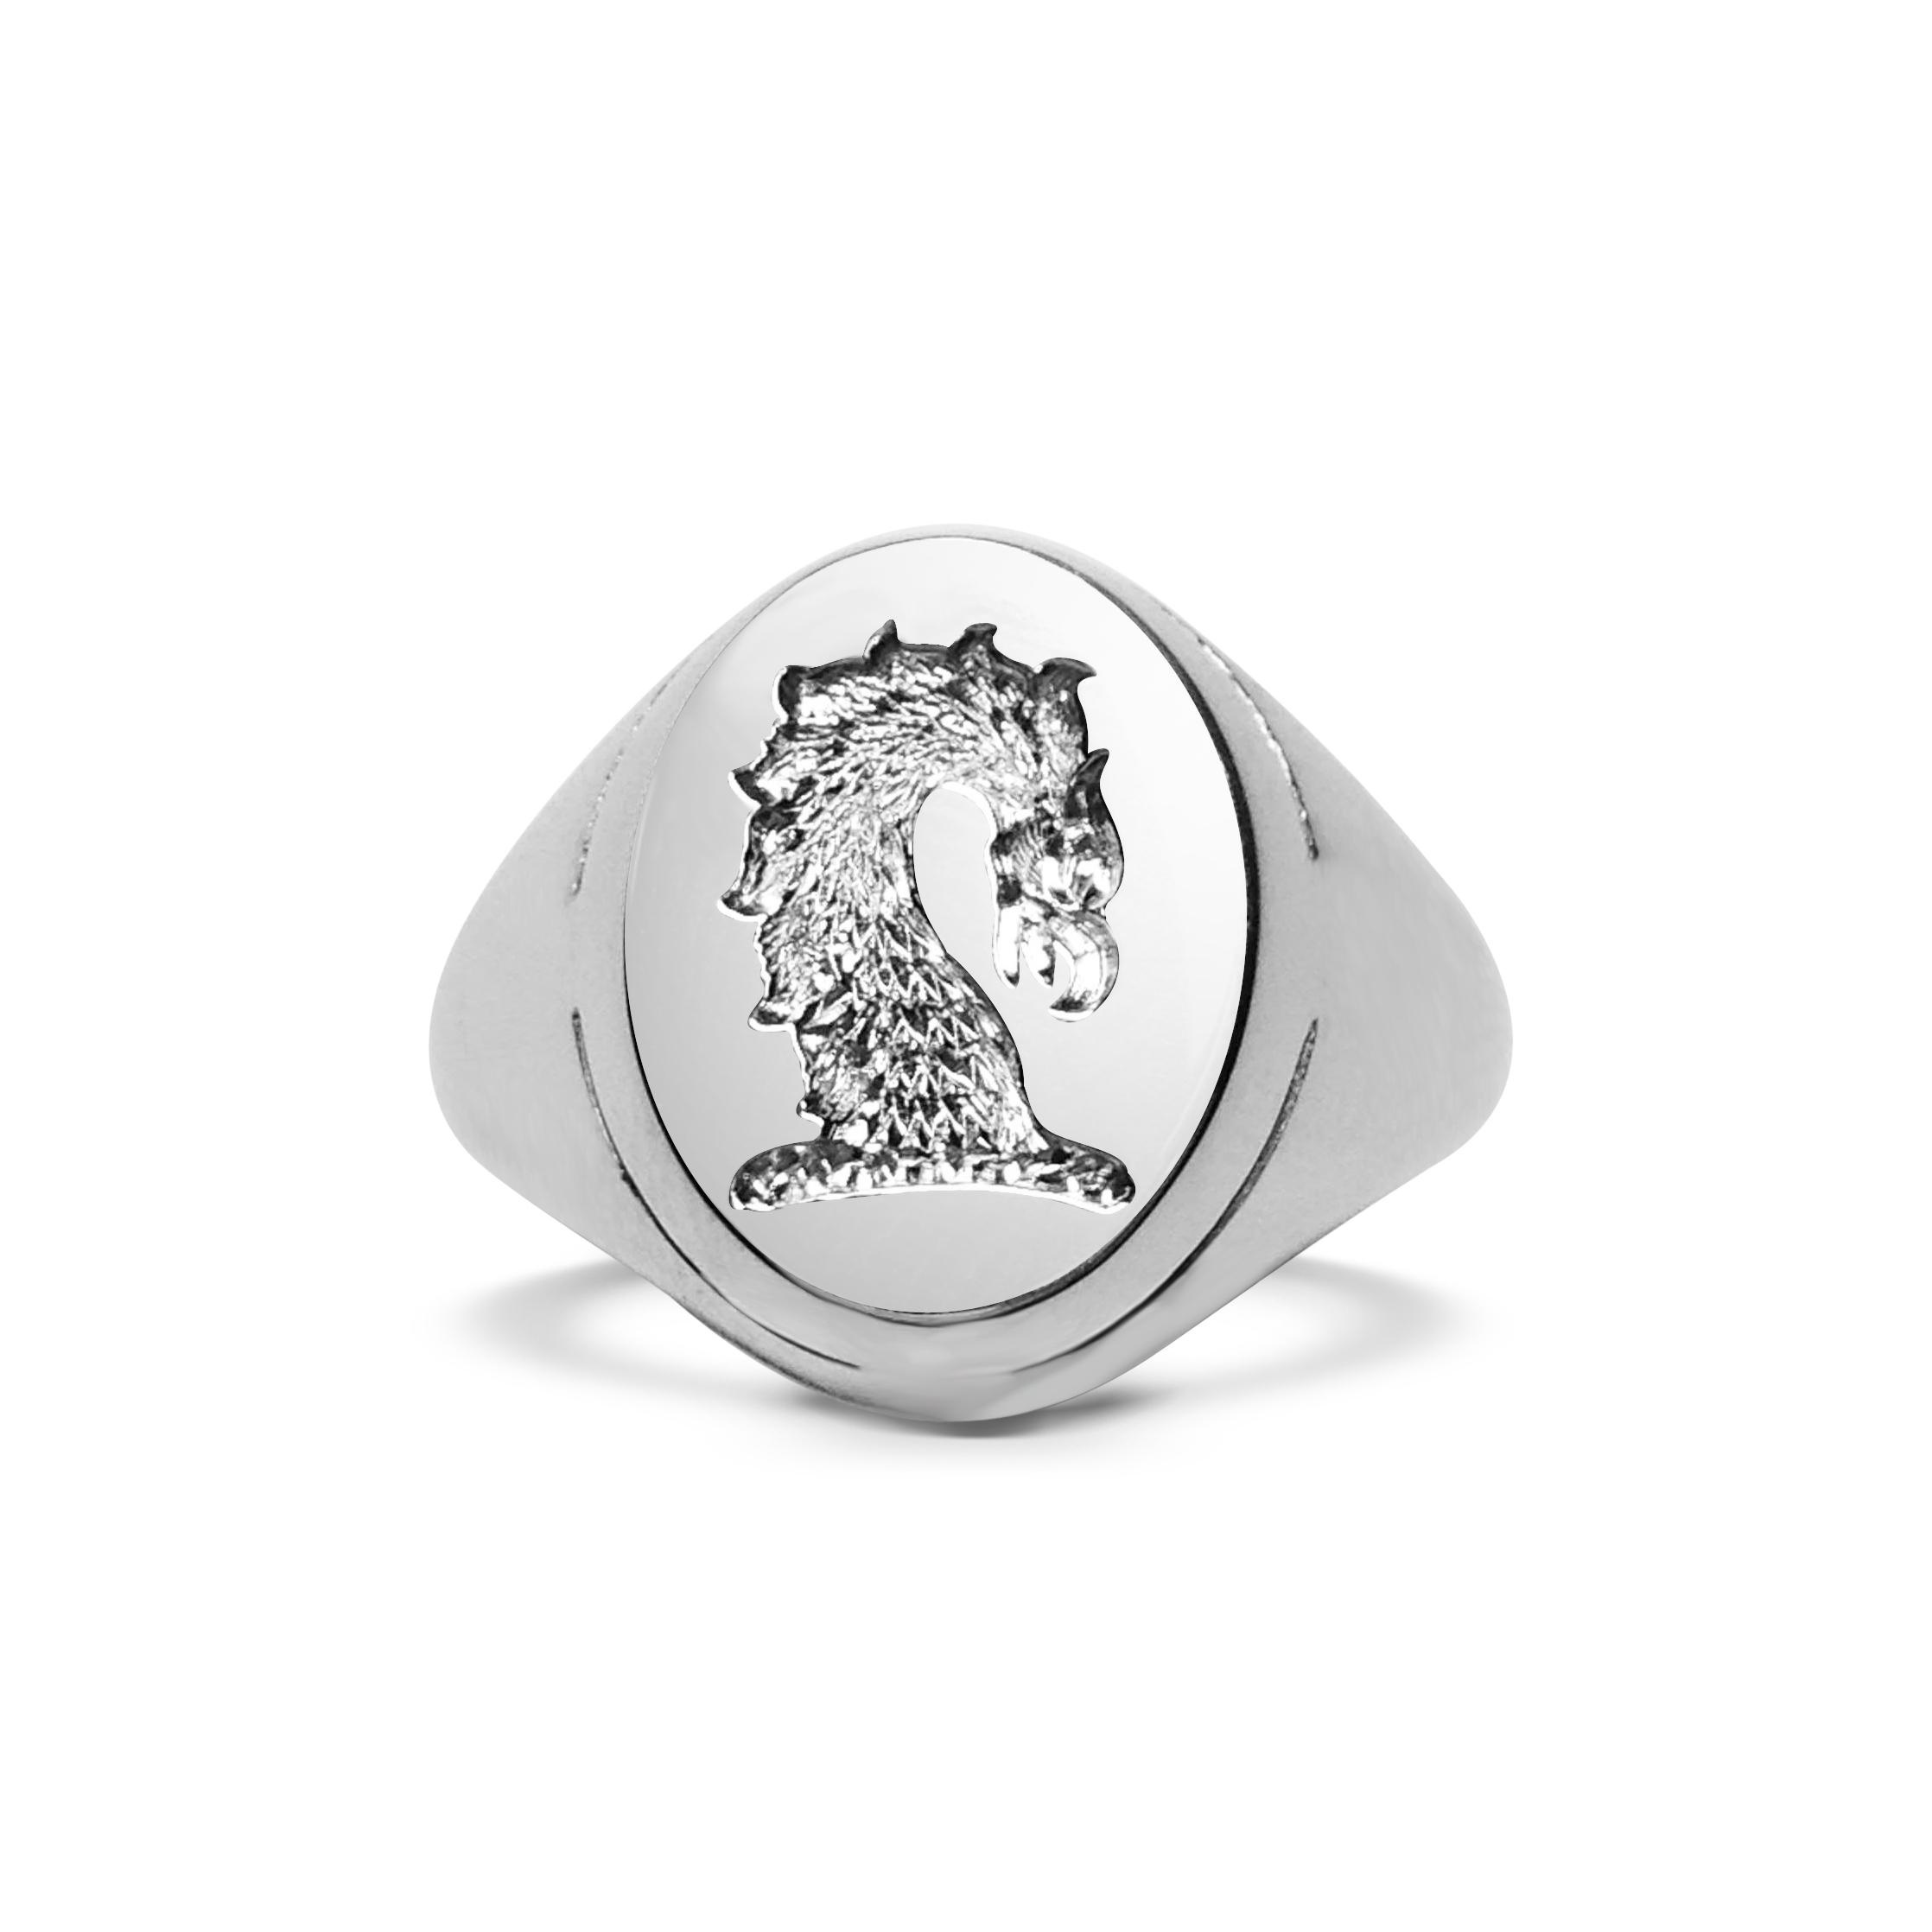 18ct-white-gold-signet-ring-2.jpg